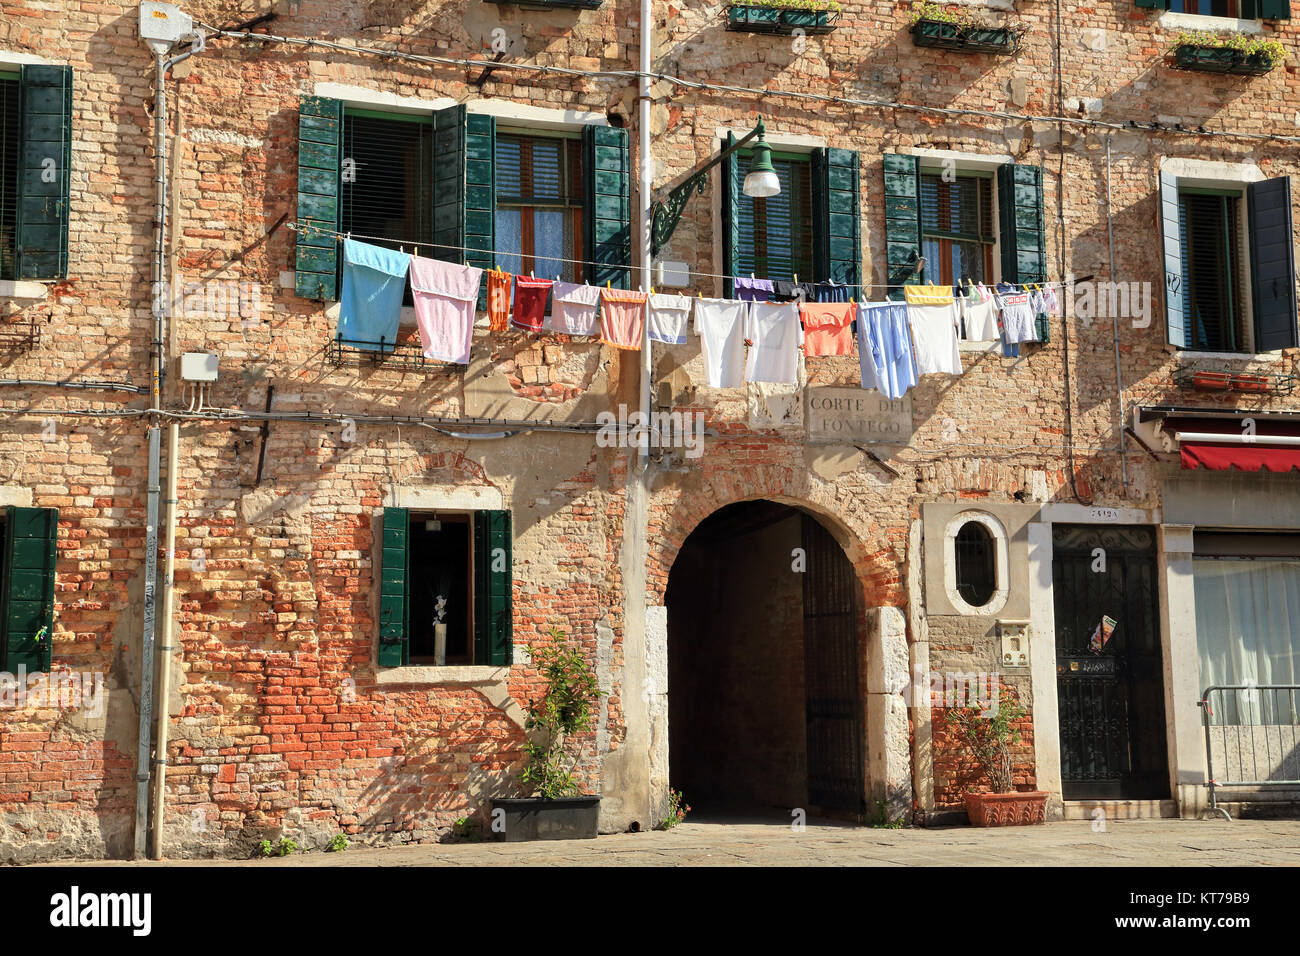 Clothesline, Campo Santa Margherita - Stock Image